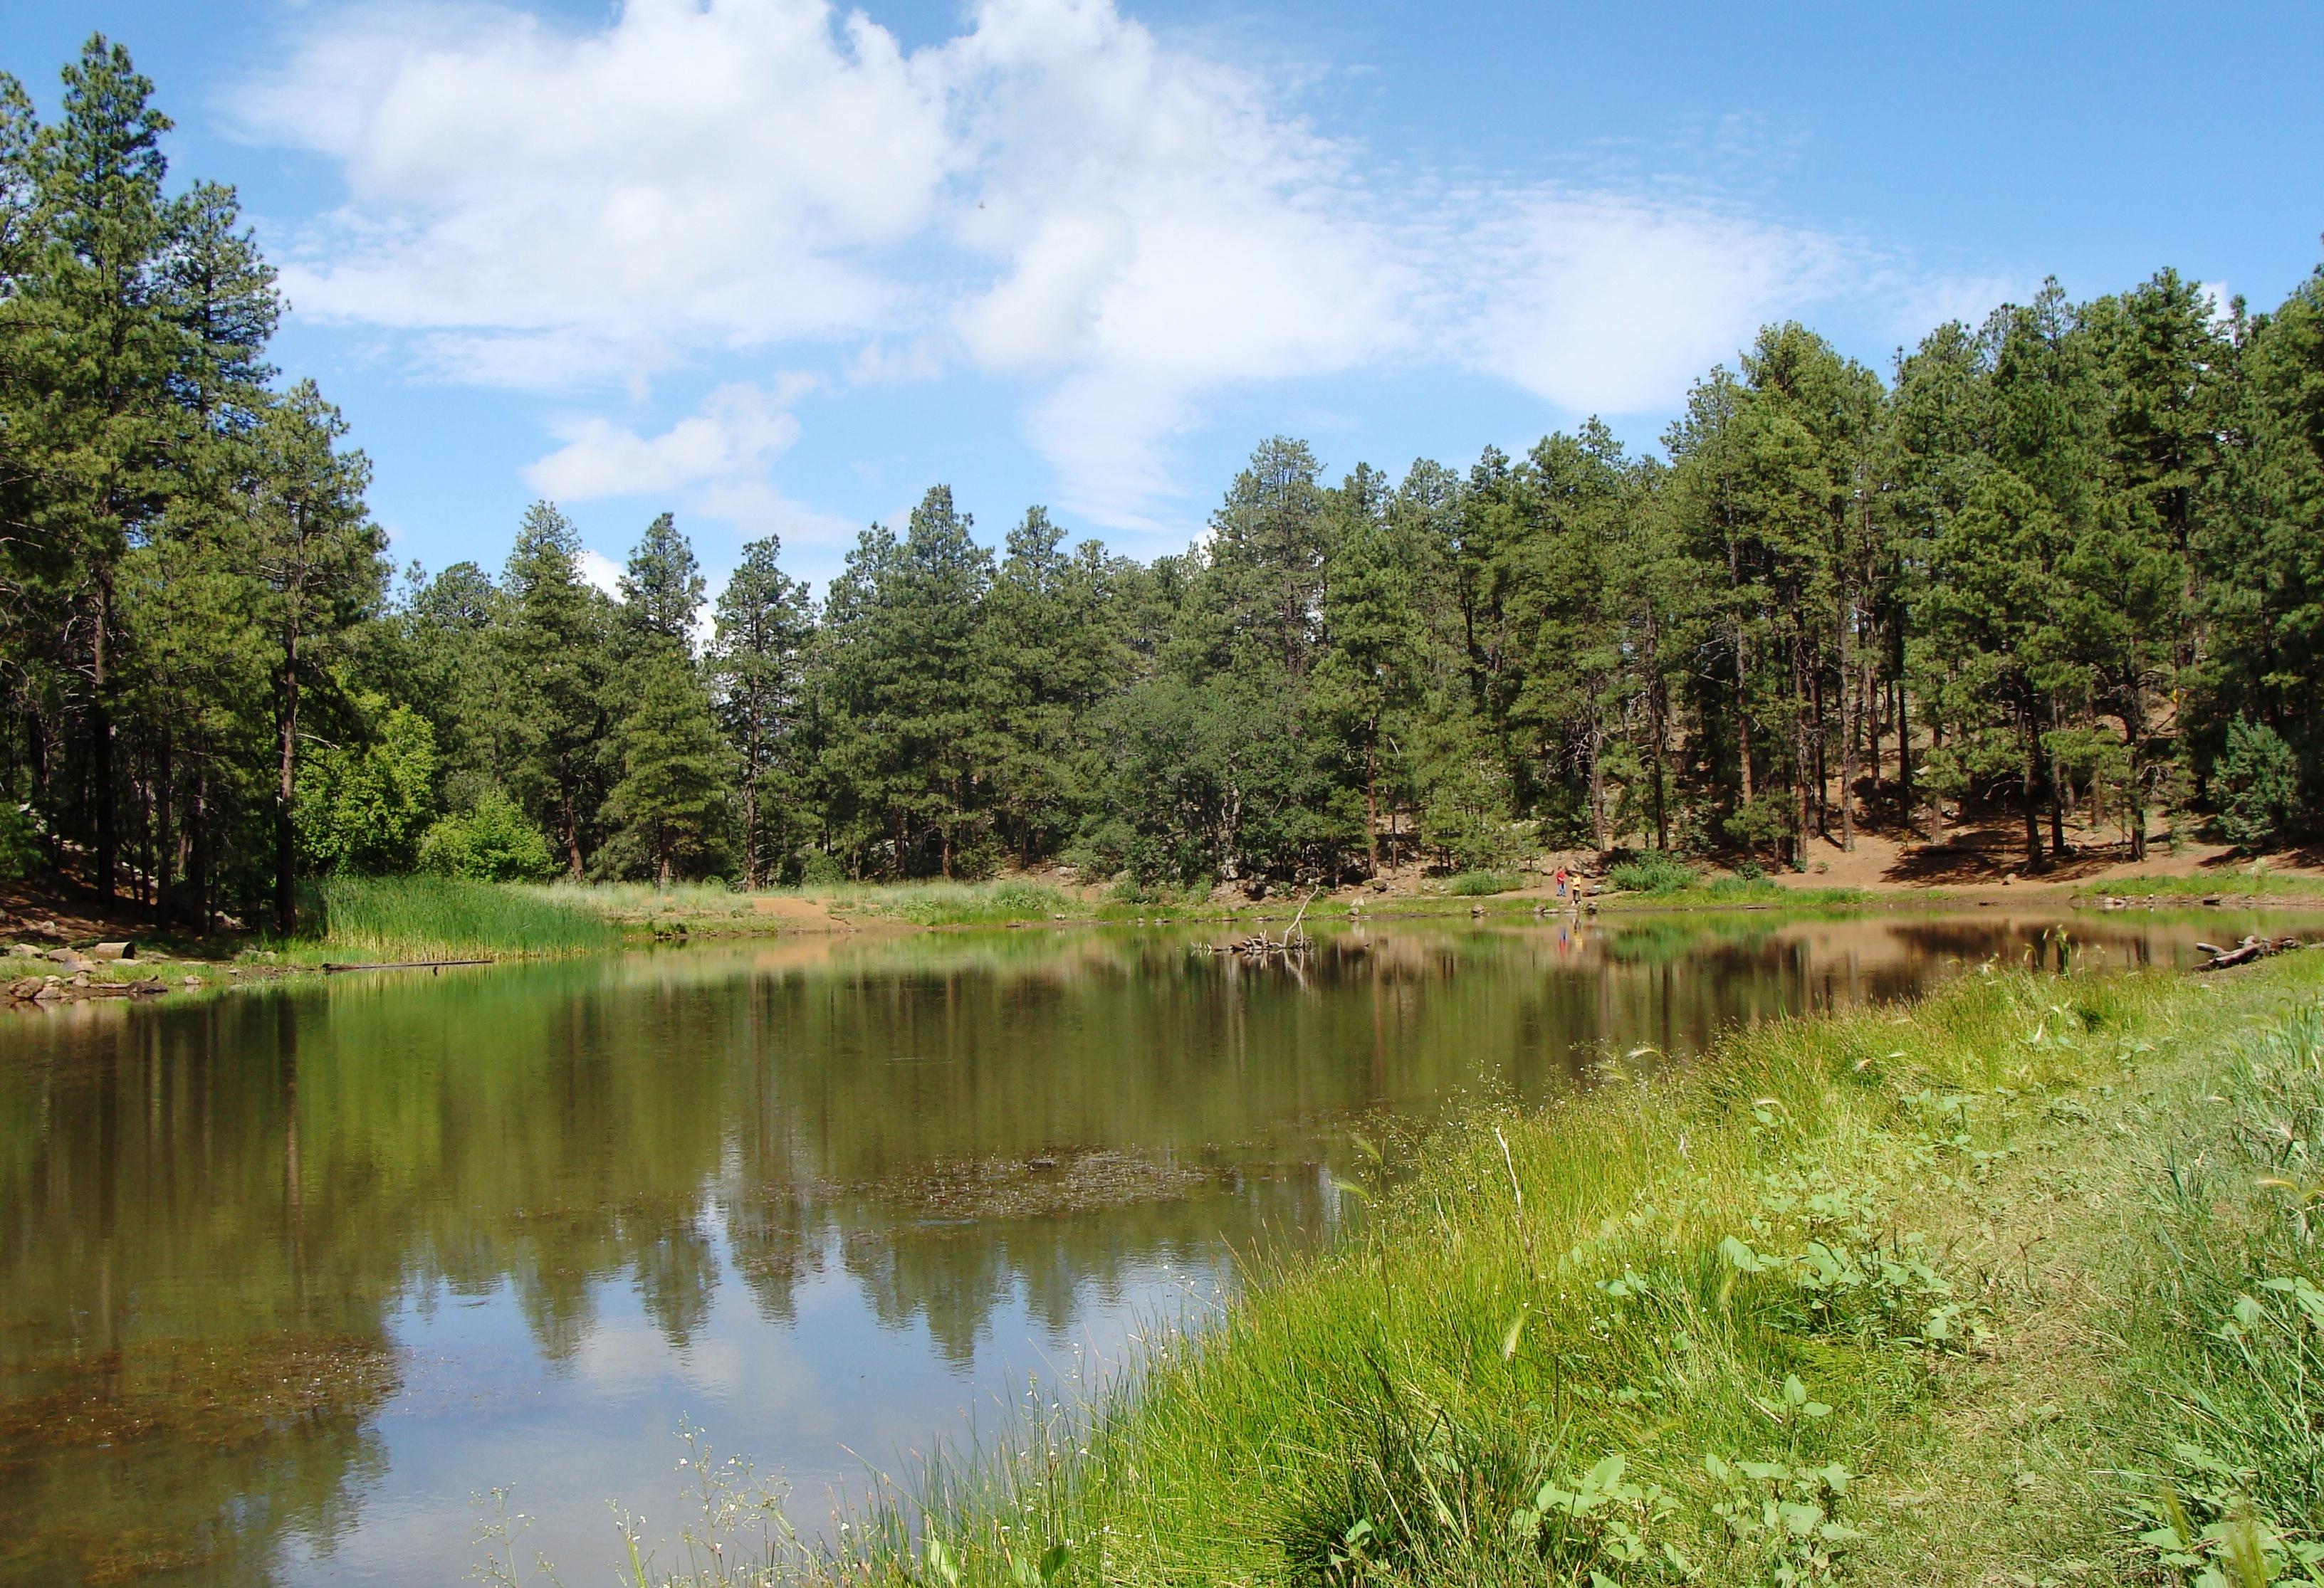 Prescott national forest wikiwand for The prescott